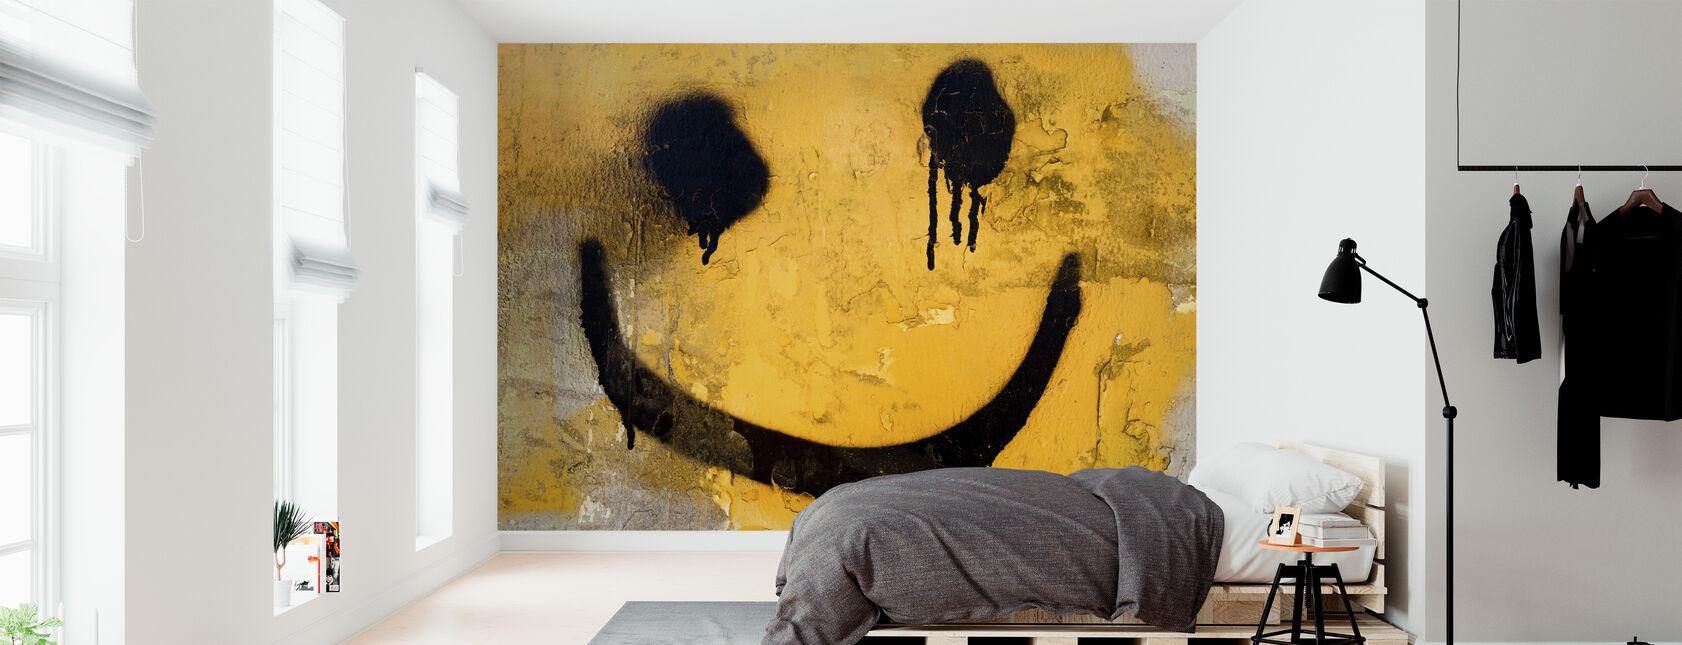 Smiley Face - Wallpaper - Bedroom